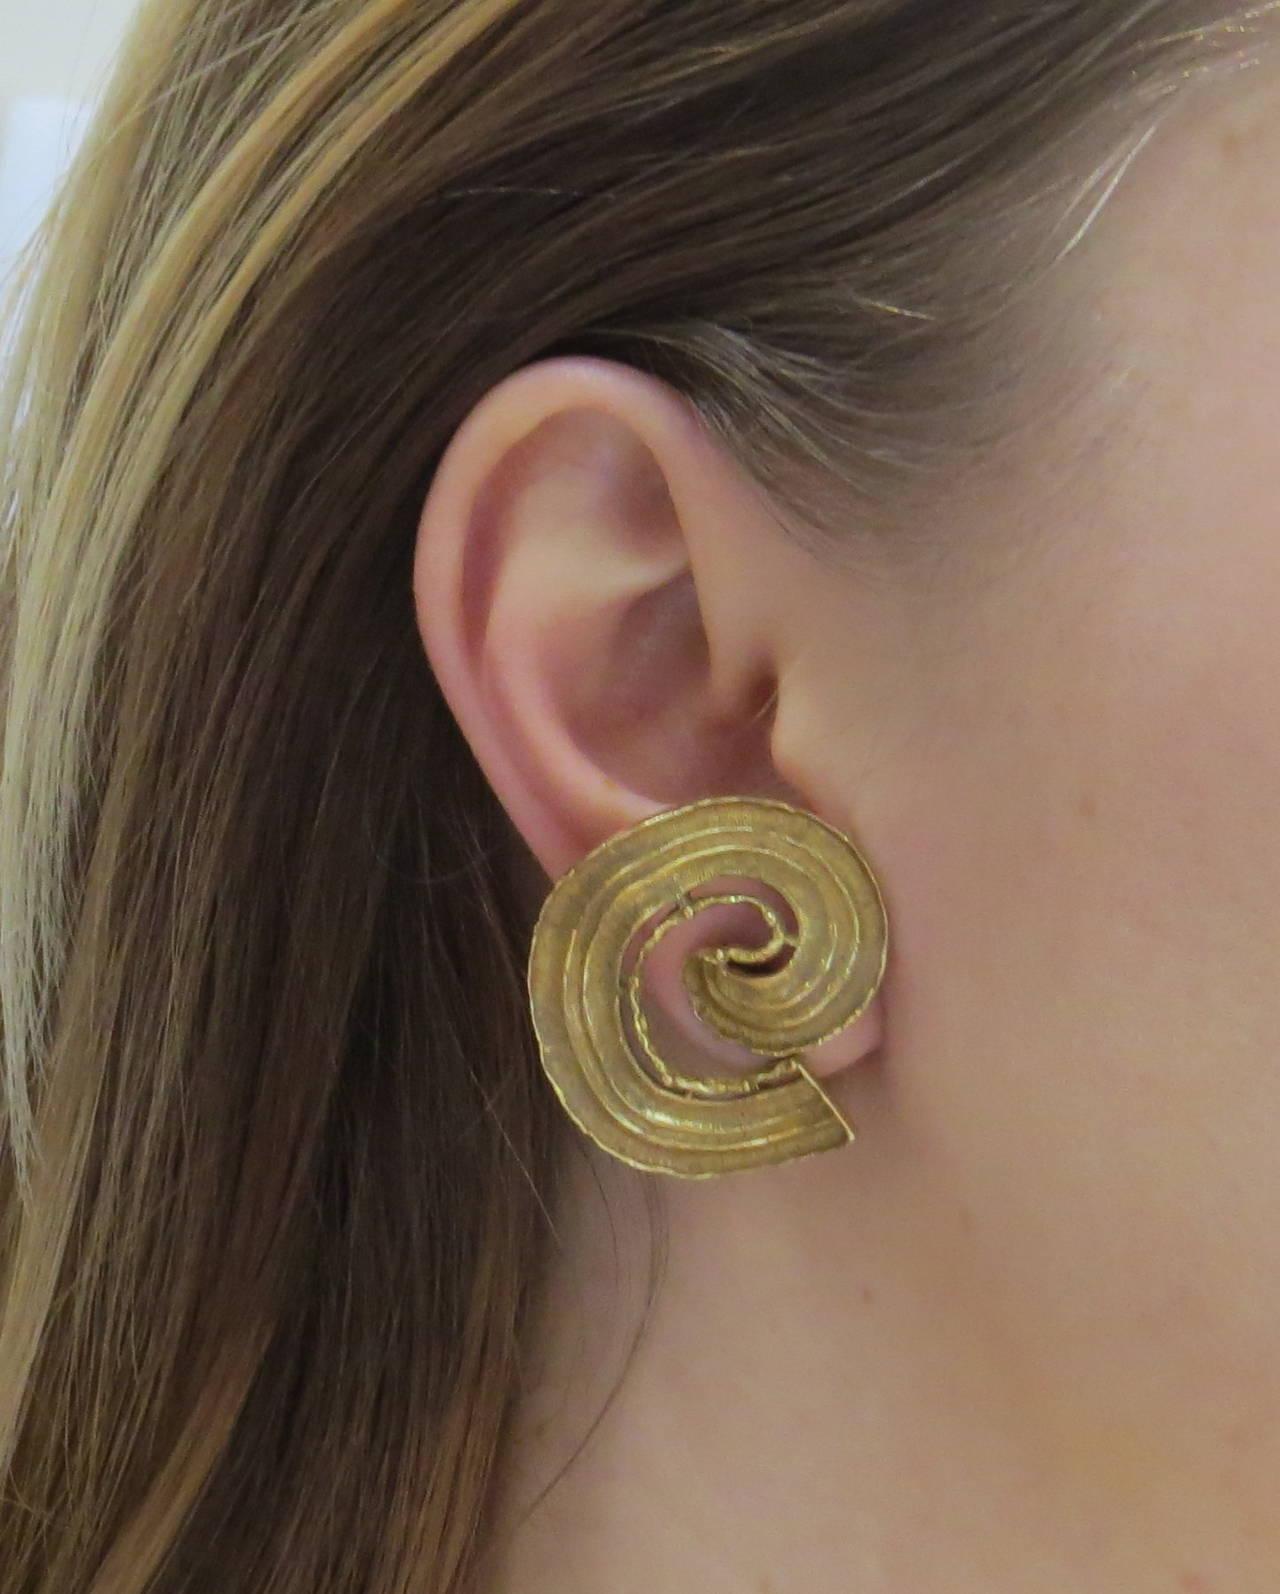 Large 1970s Ilias Lalaounis Gold Swirl Earrings 2